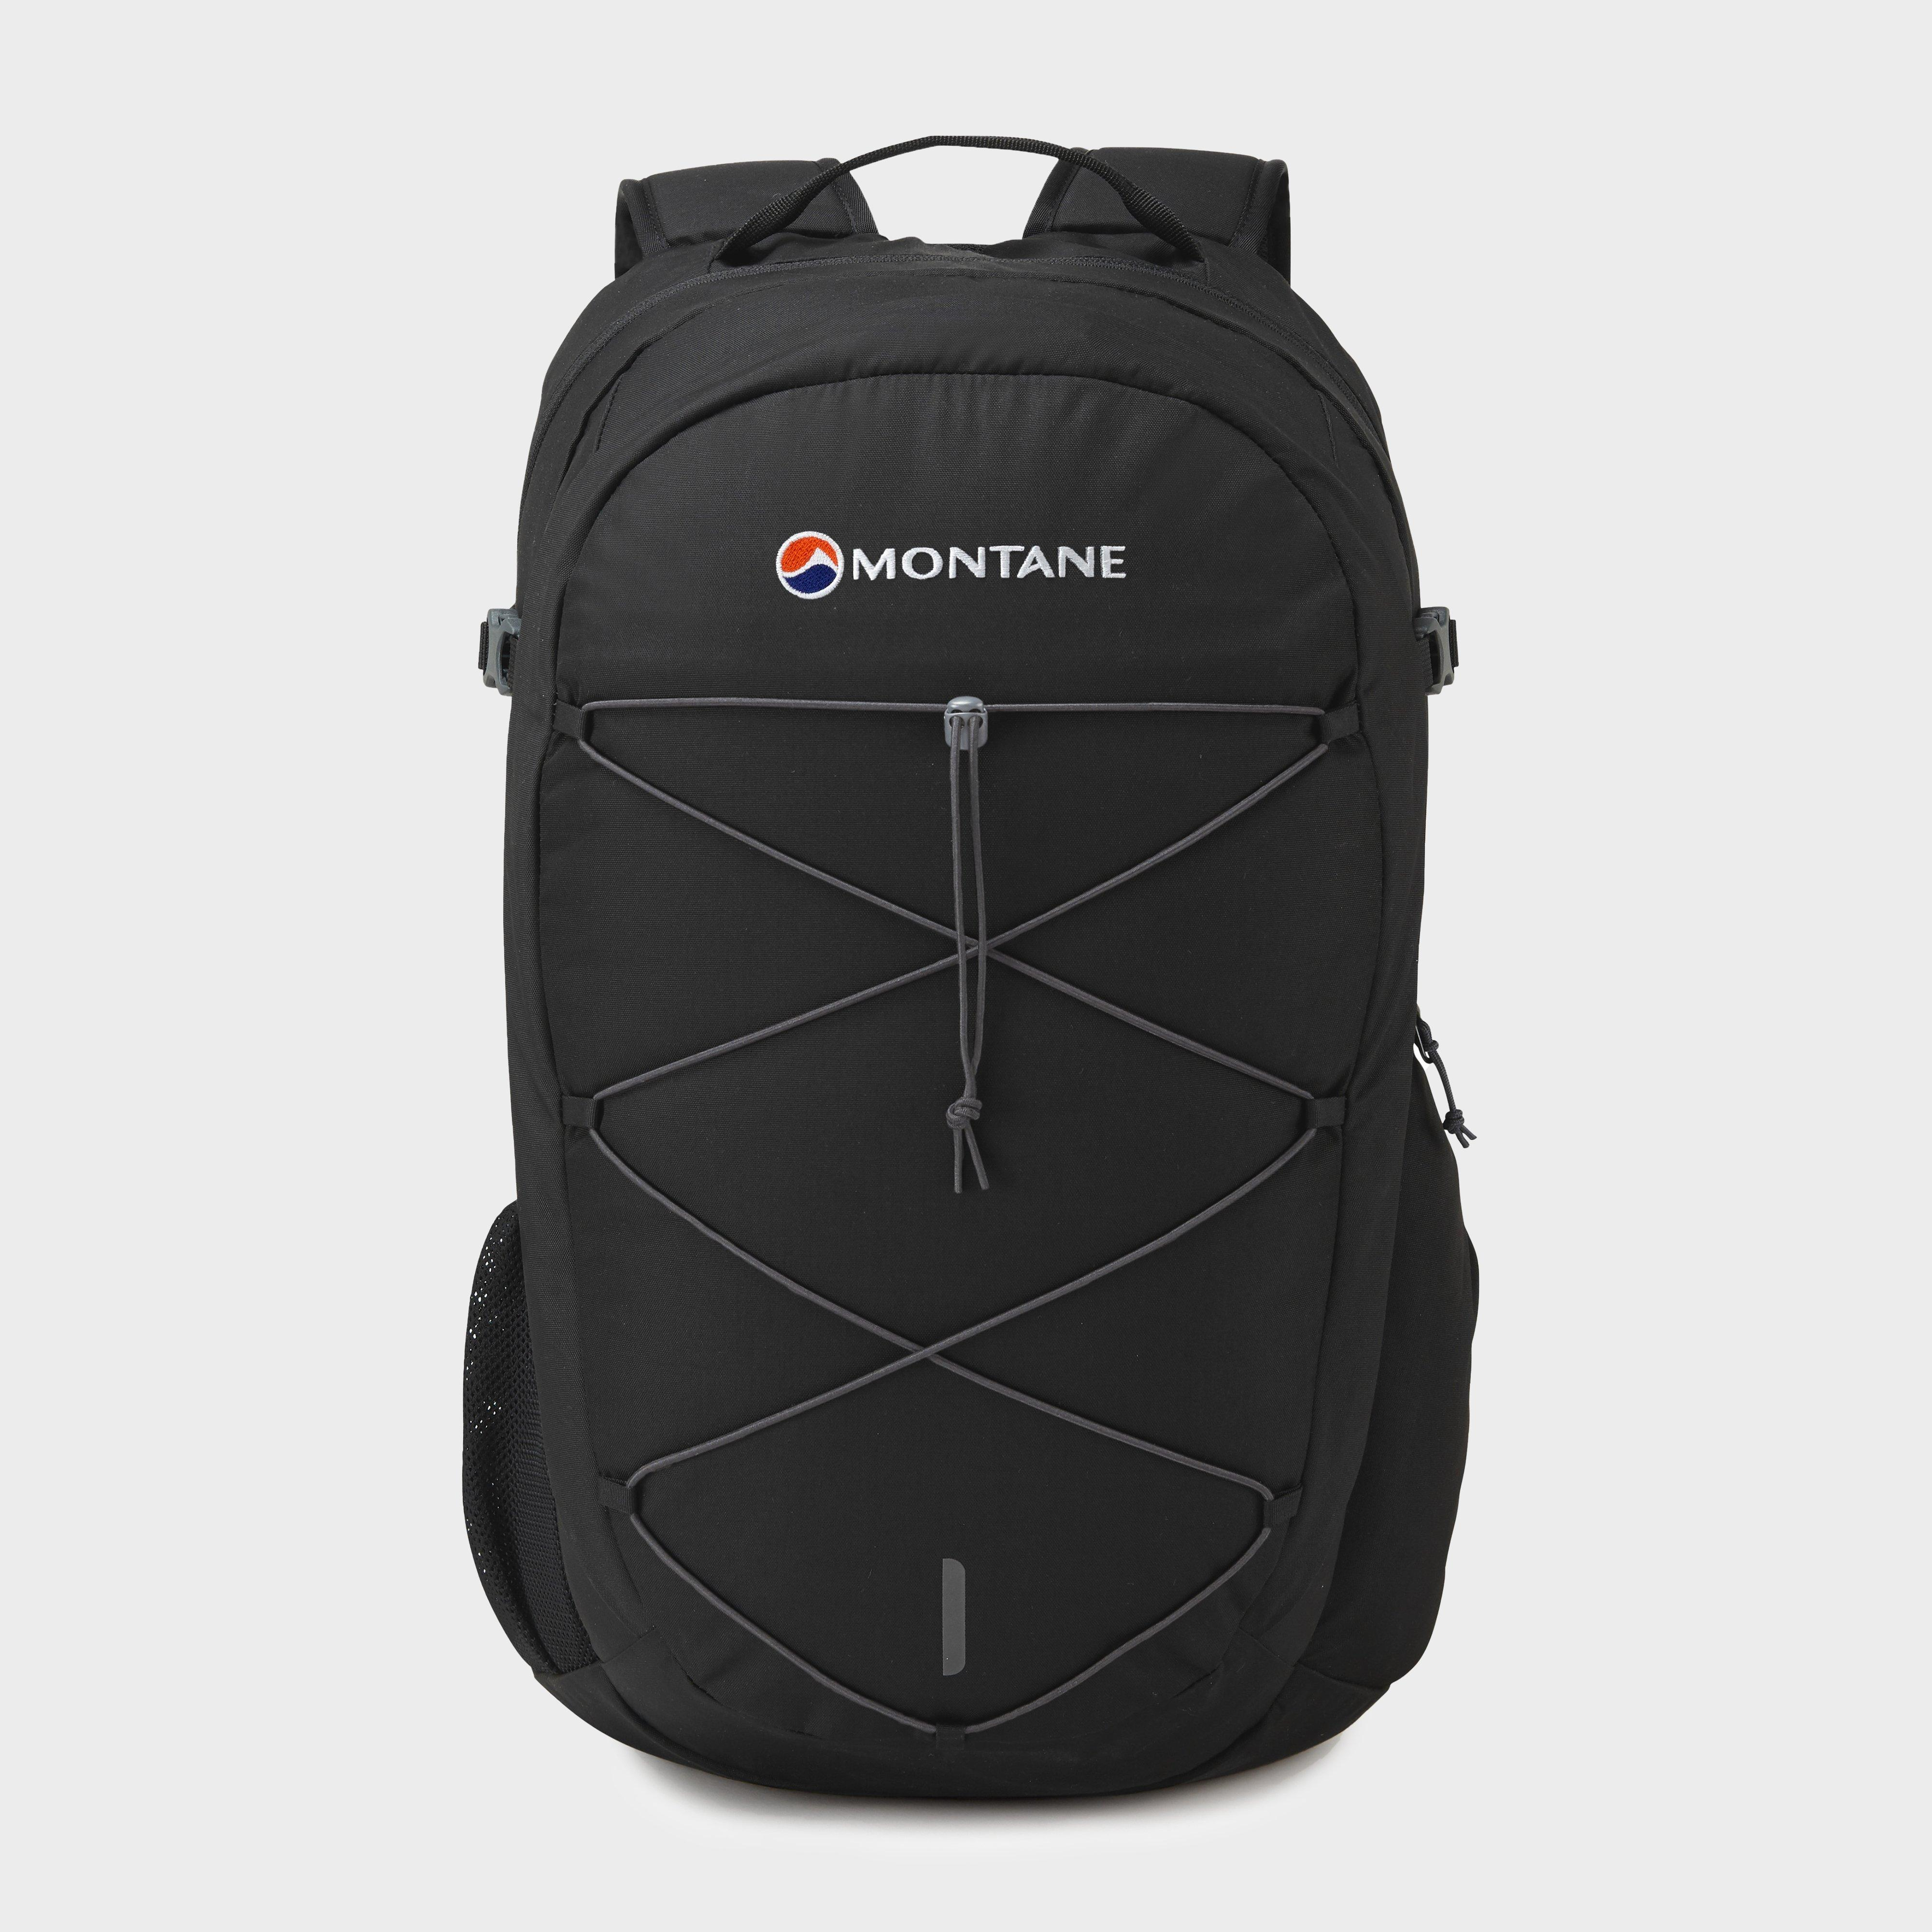 Montane Montane Switch 30 Daypack, Black